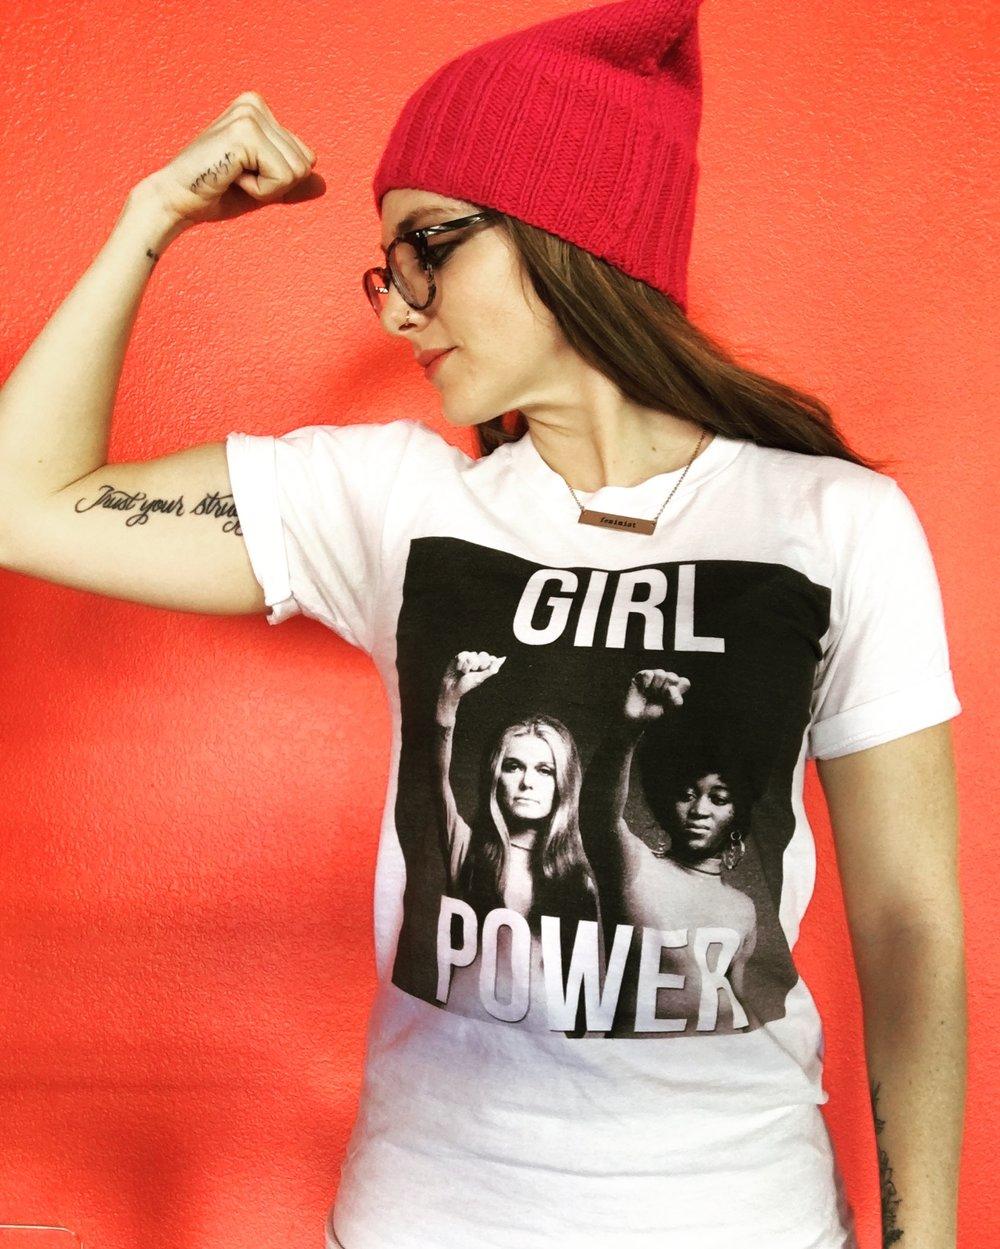 LETSCHAT_Meet-Jessica-Kwock_TheForeverFeminist_5.jpg